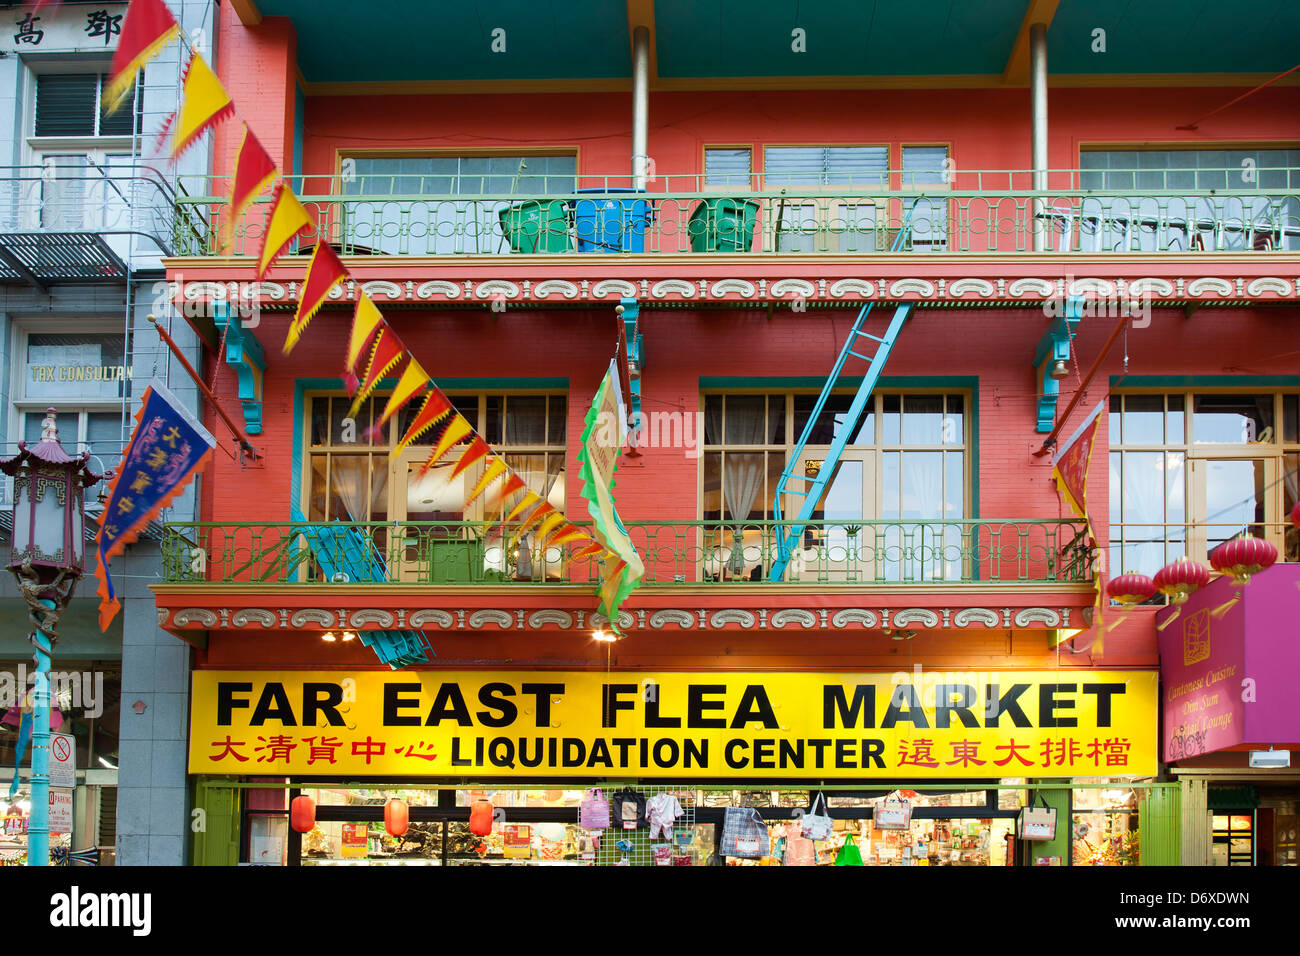 Colorido mercadillo de 'Far East', Chinatown, San Francisco, California, EE.UU. Imagen De Stock